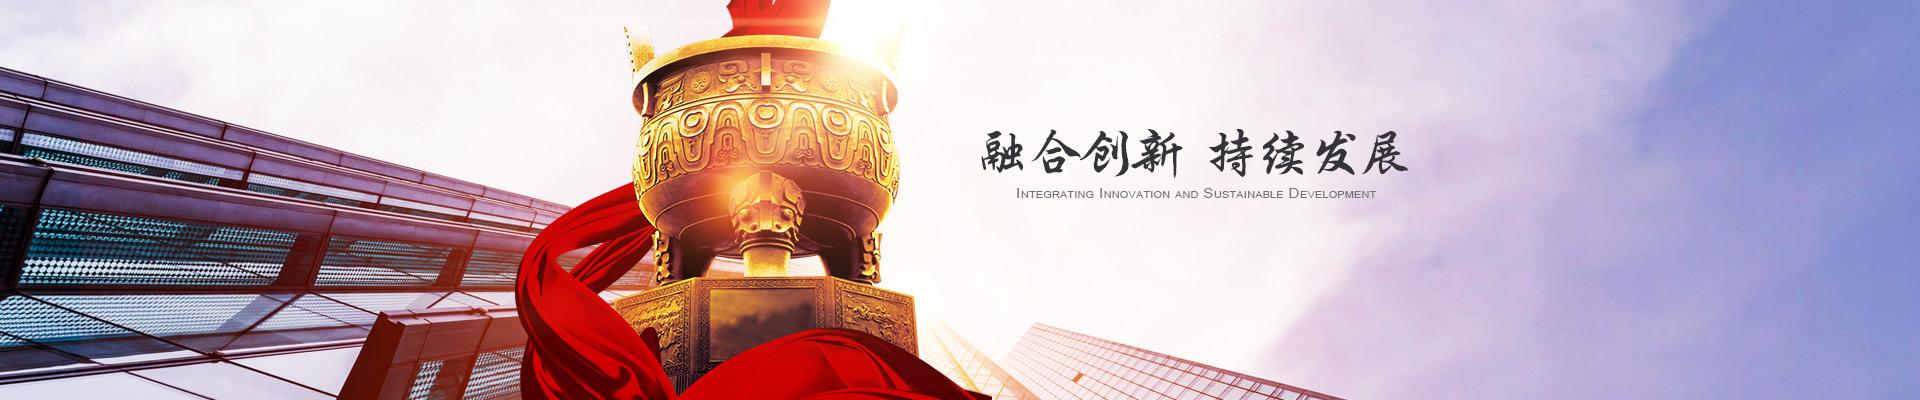 必威体育官网下载_betway体育亚洲版入口|下载入口